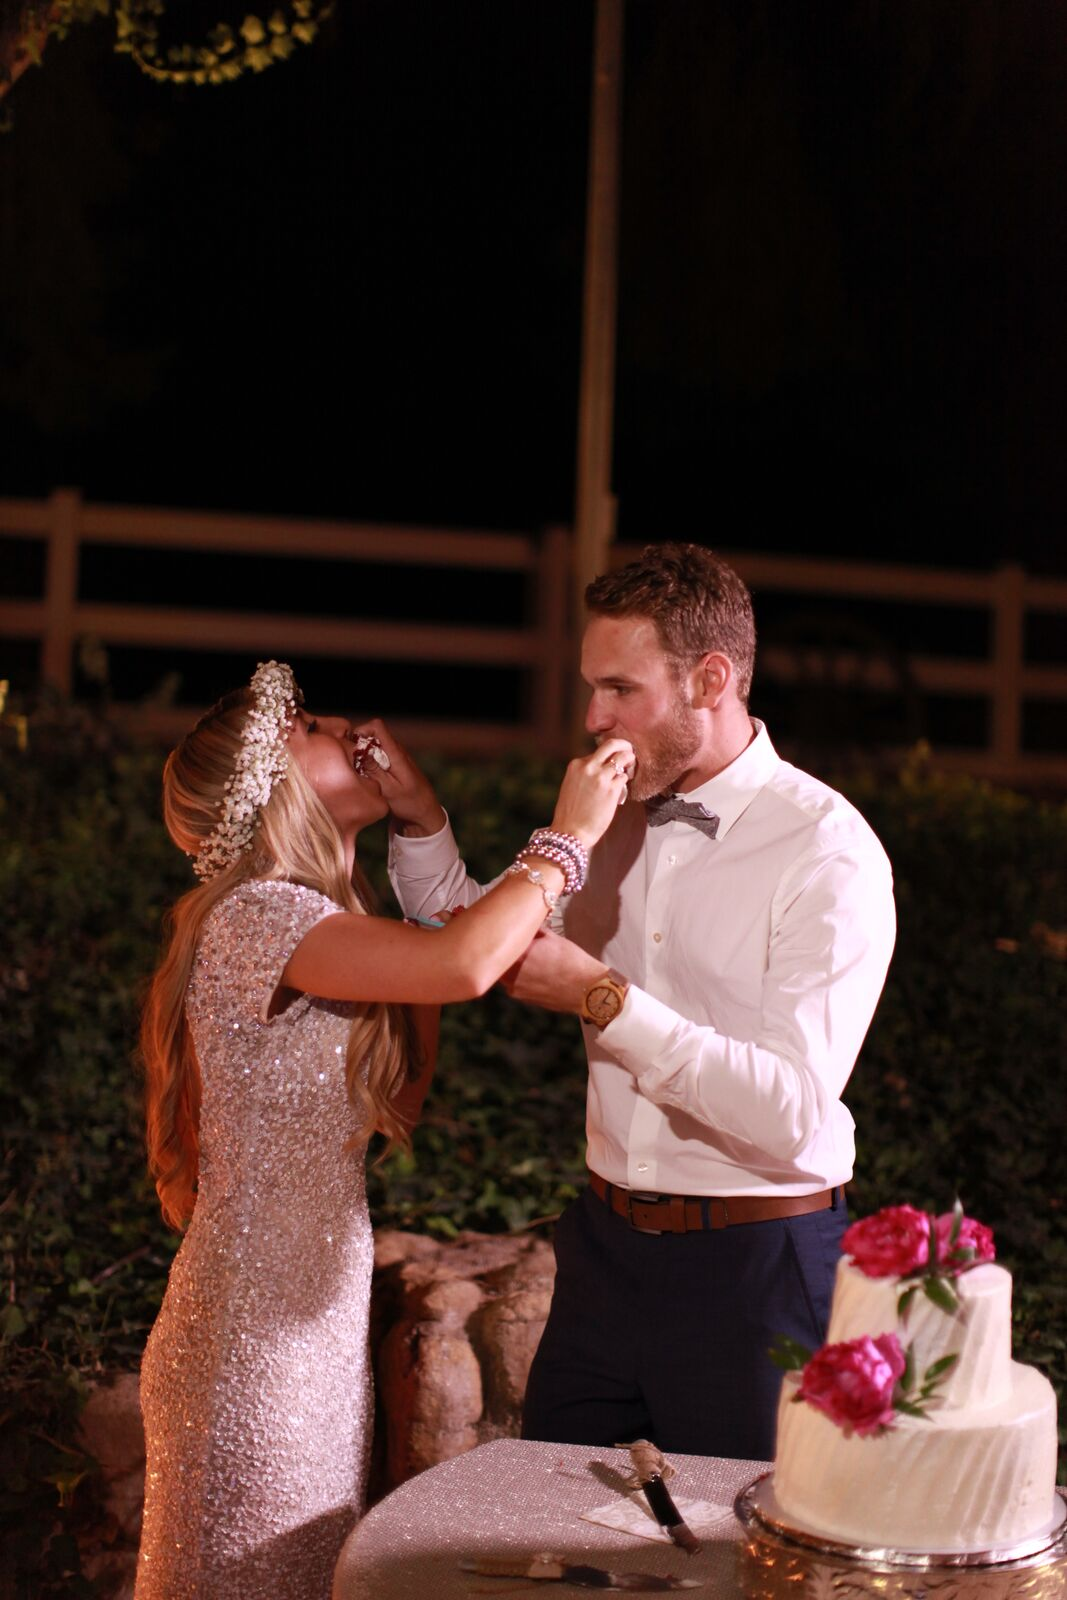 las vegas wedding planner, cake cutting, bride and groom cake cutting